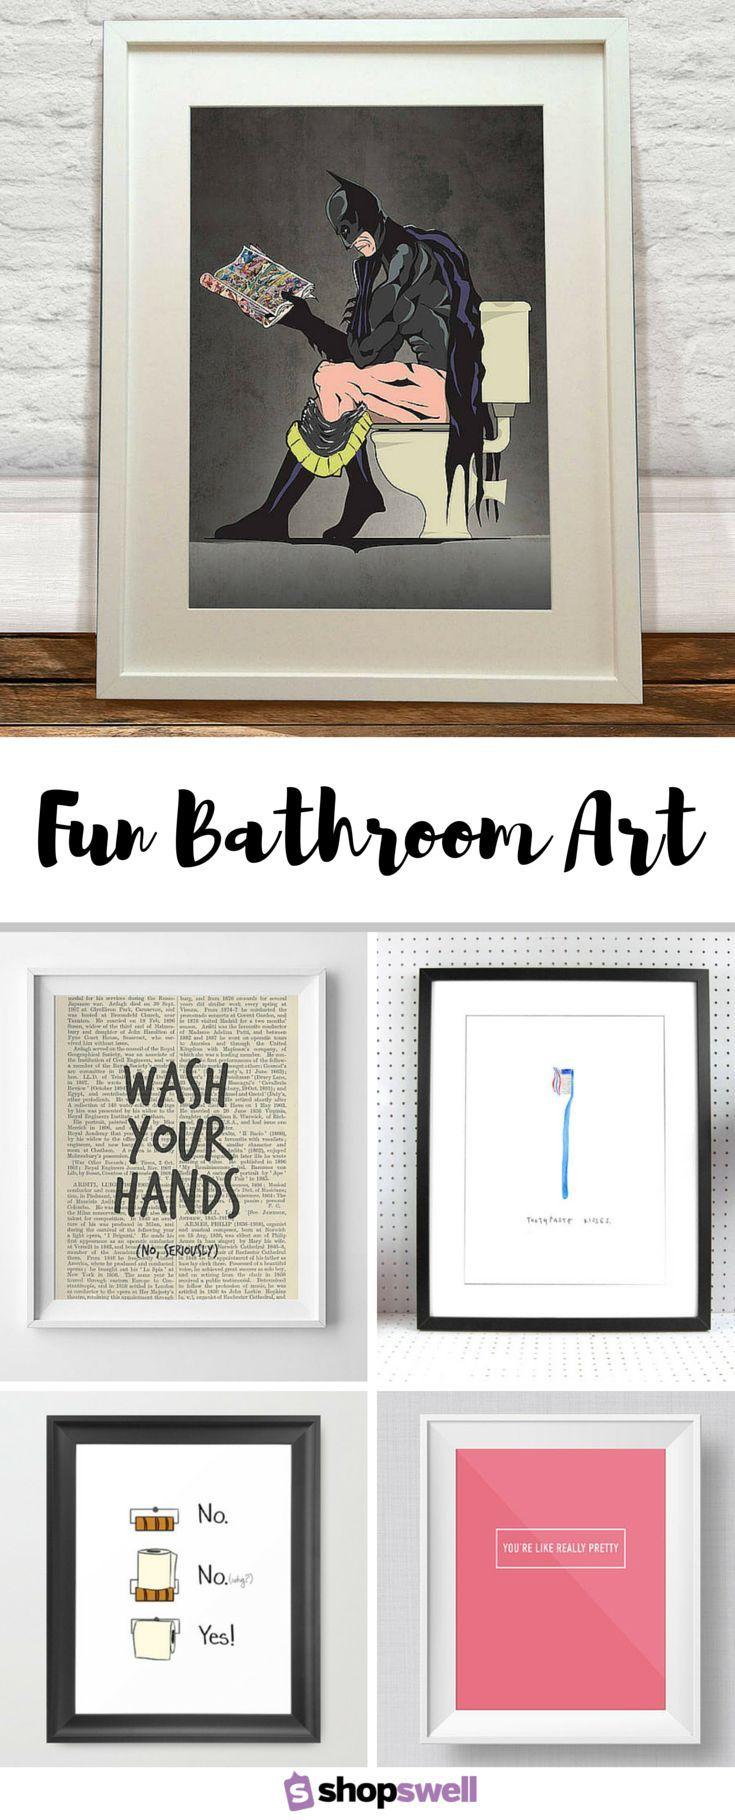 Fun Bathroom Art Walls Printing And Bathroom Art - Bathroom signs for home for bathroom decor ideas